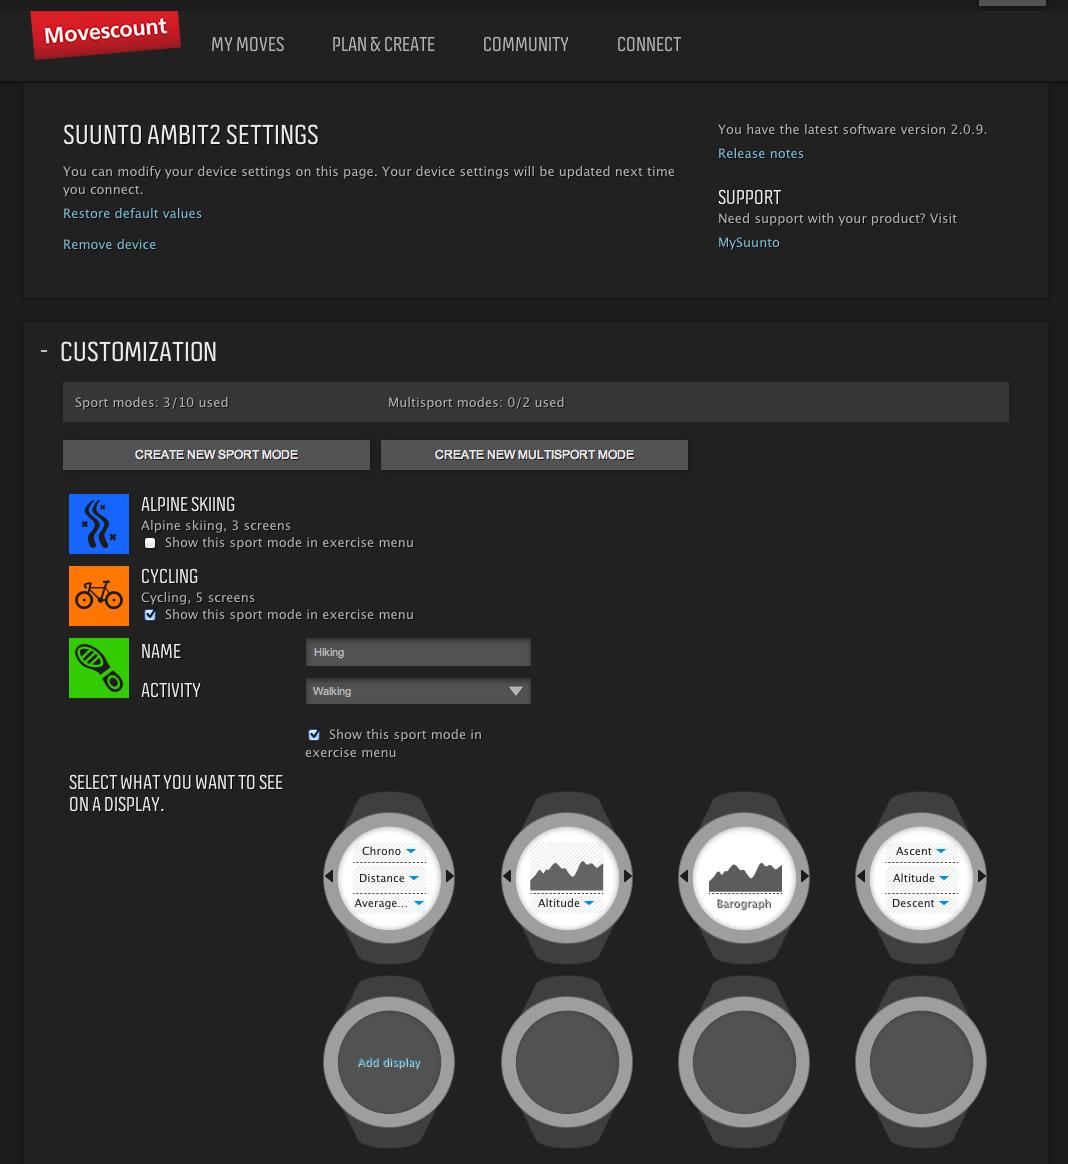 Movescount's settings screen.